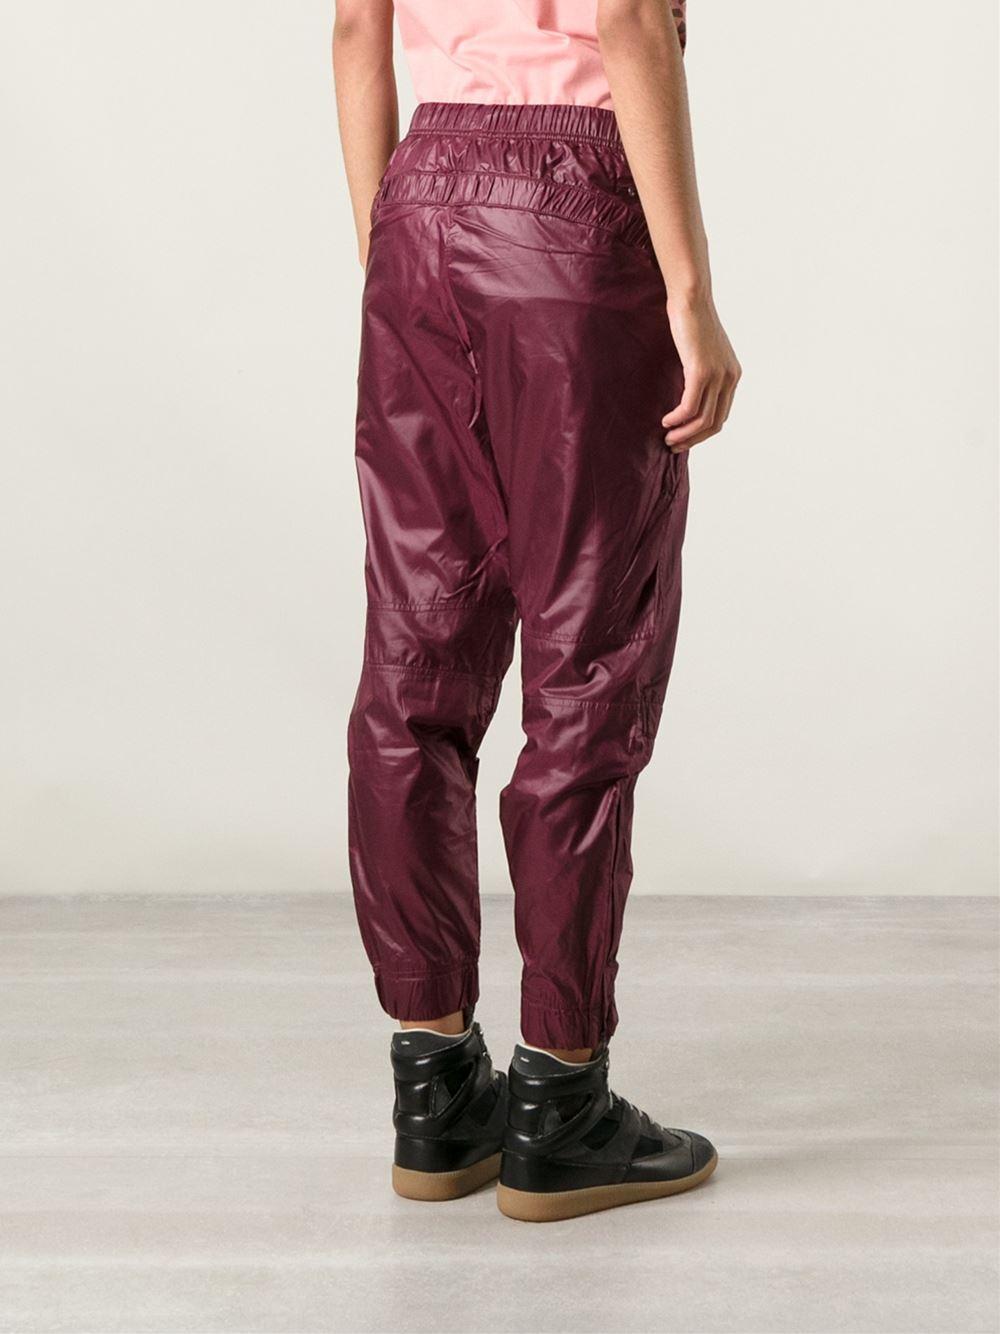 lyst adidas by stella mccartney drawstring track pants